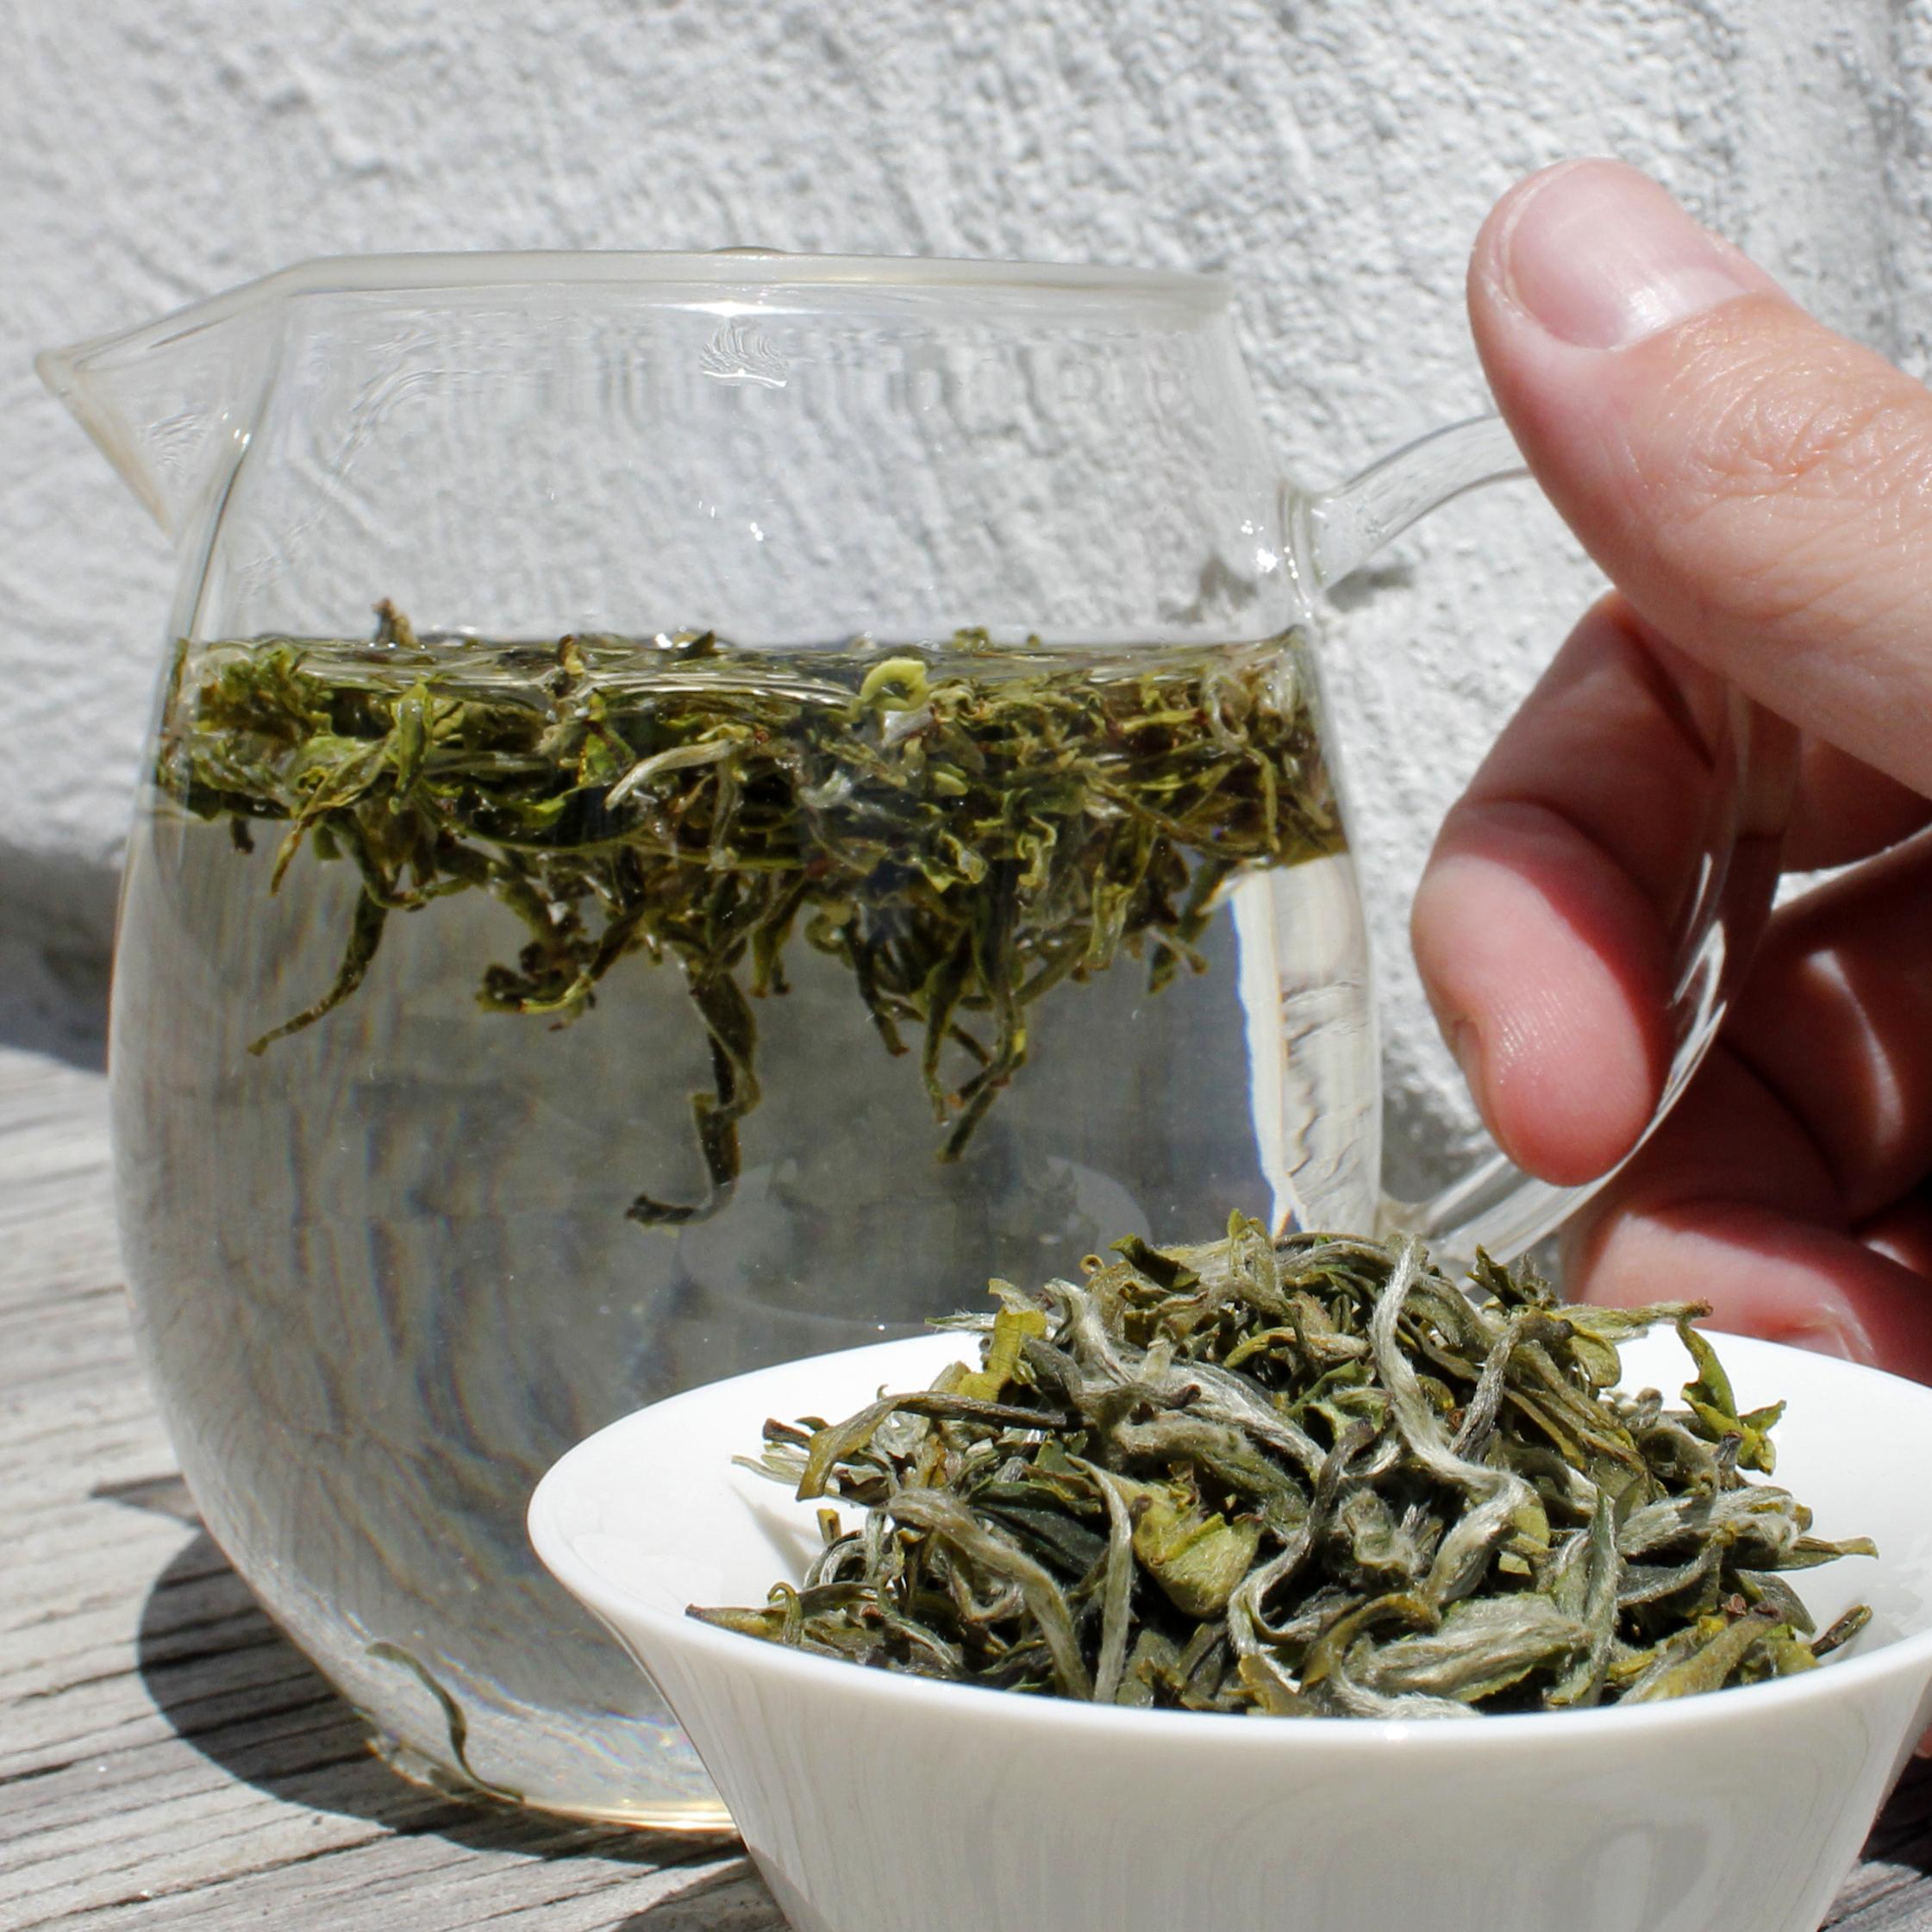 jade-spring-white-tea-nepal-nepalese-whole-leaf-loose-tea-itw3-2019a.jpg